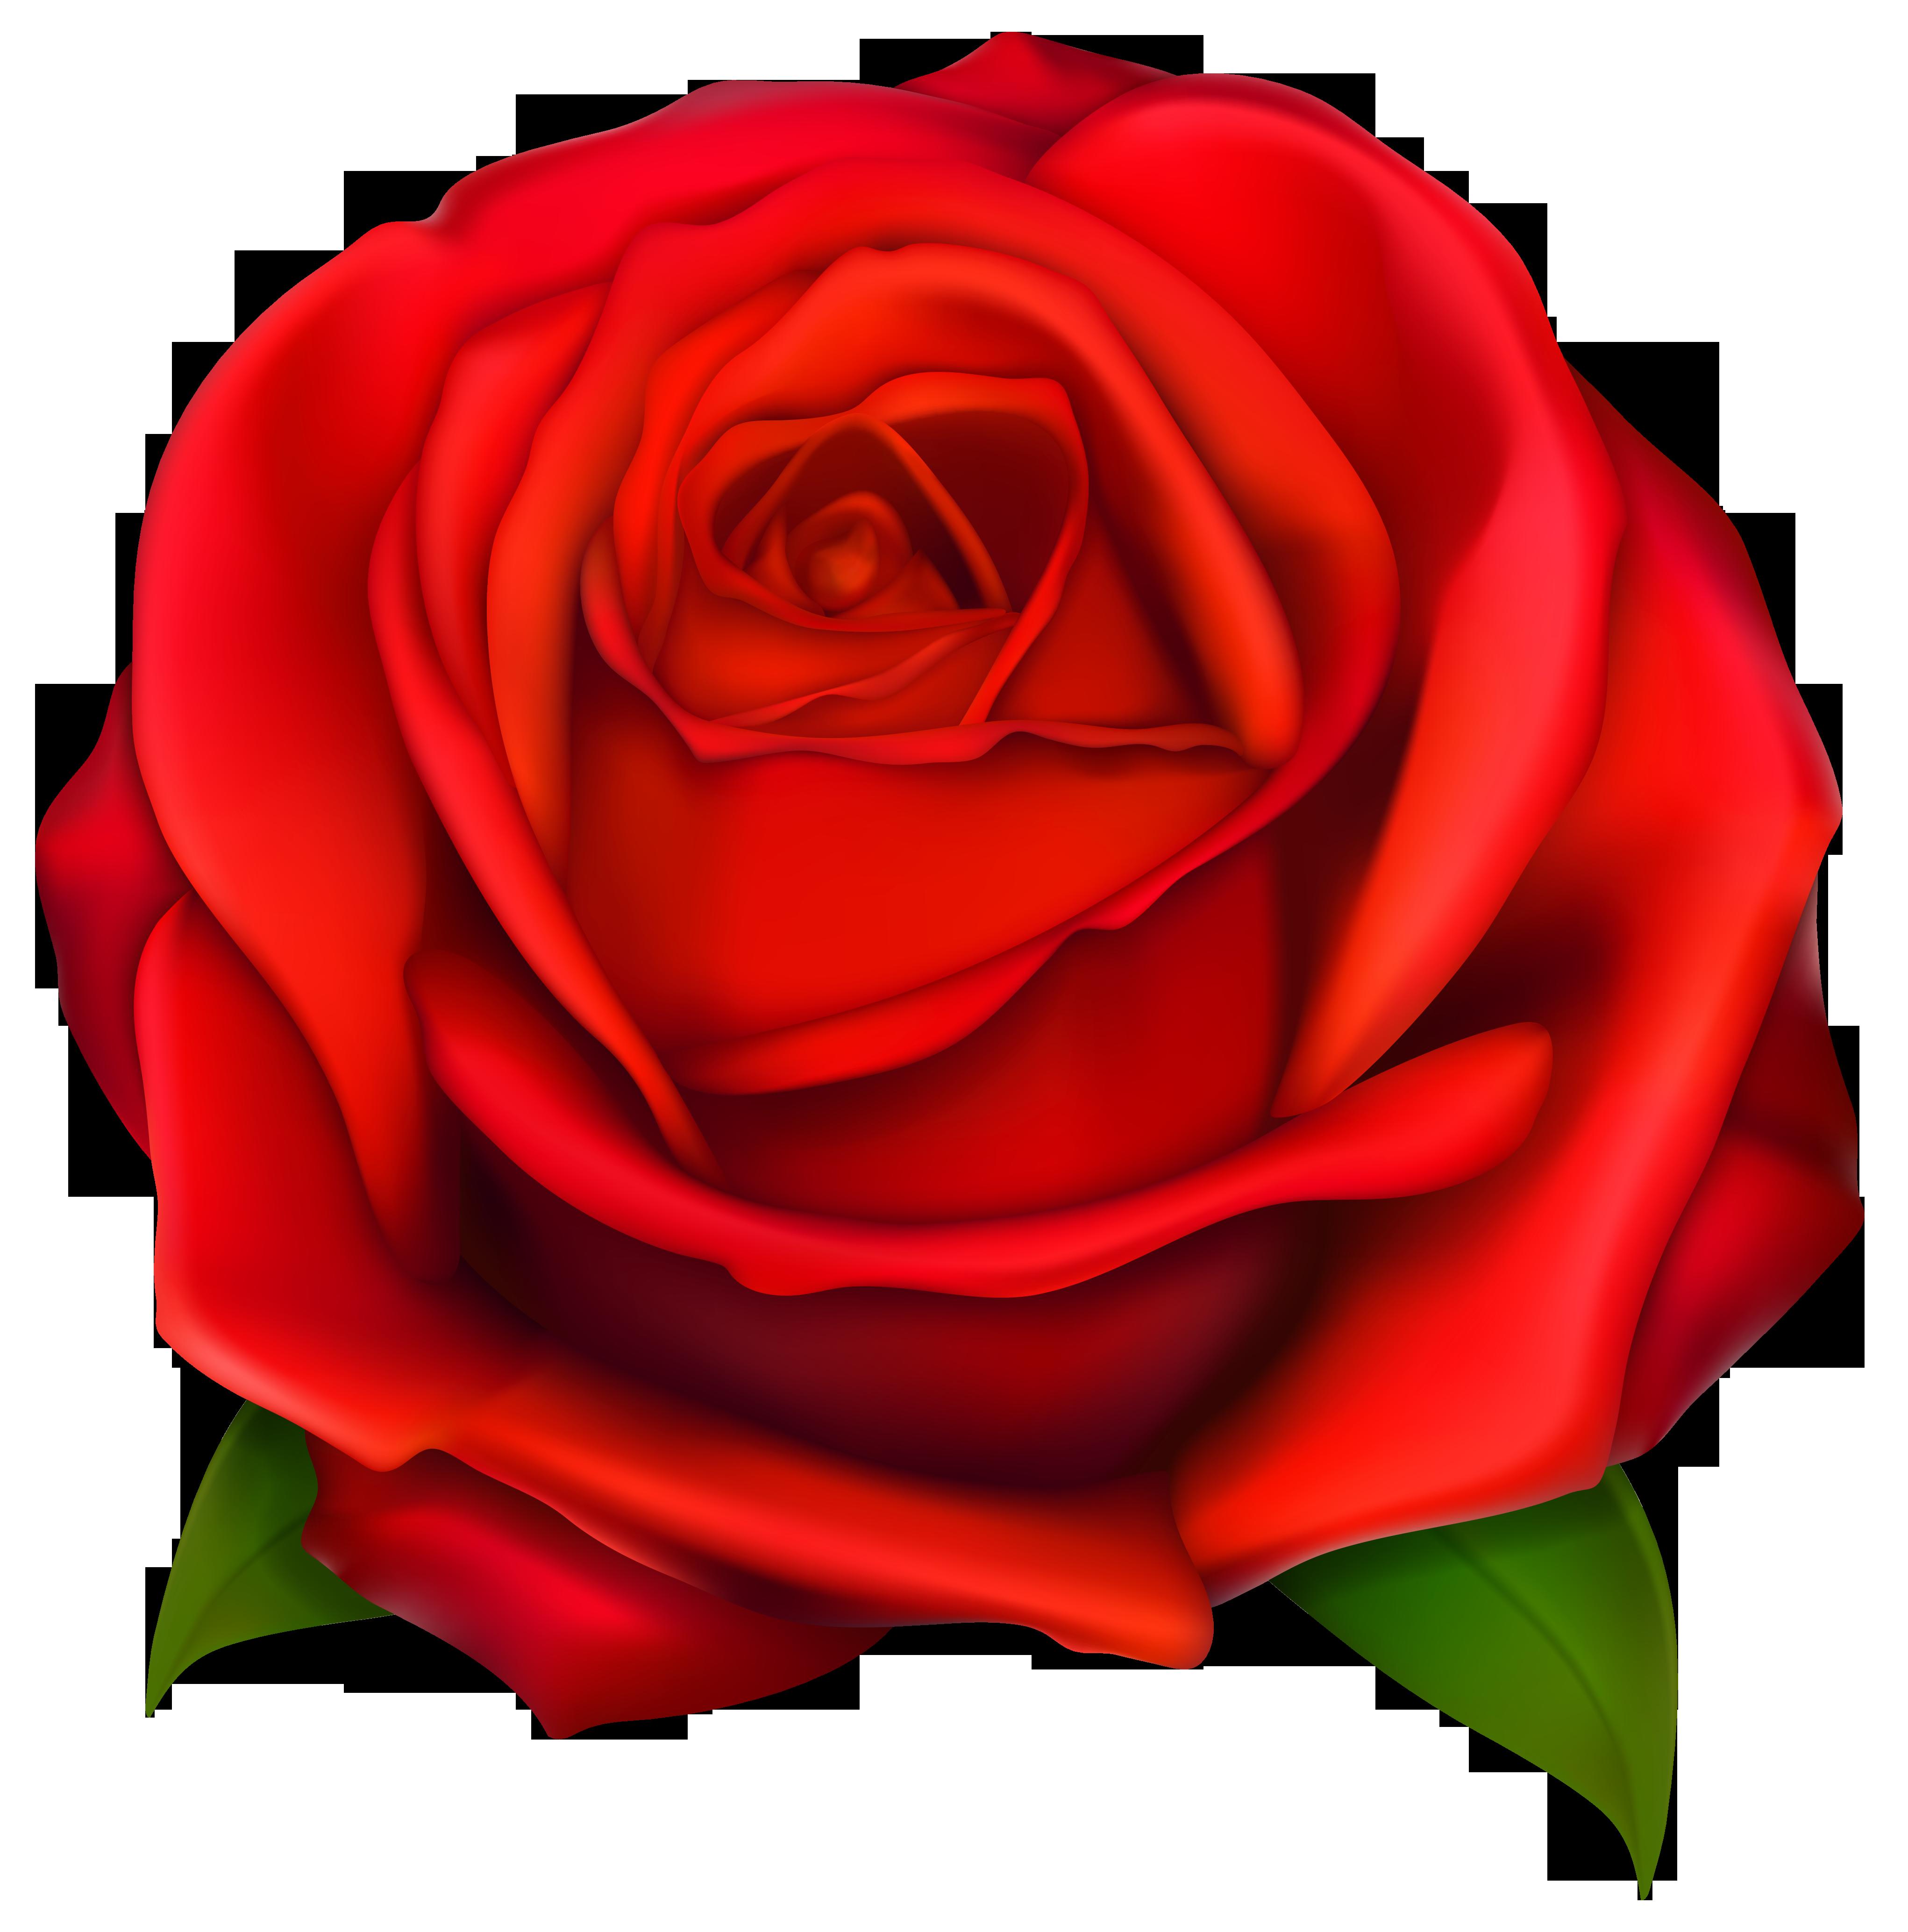 Roses free rose clipart publi - Clipart Roses